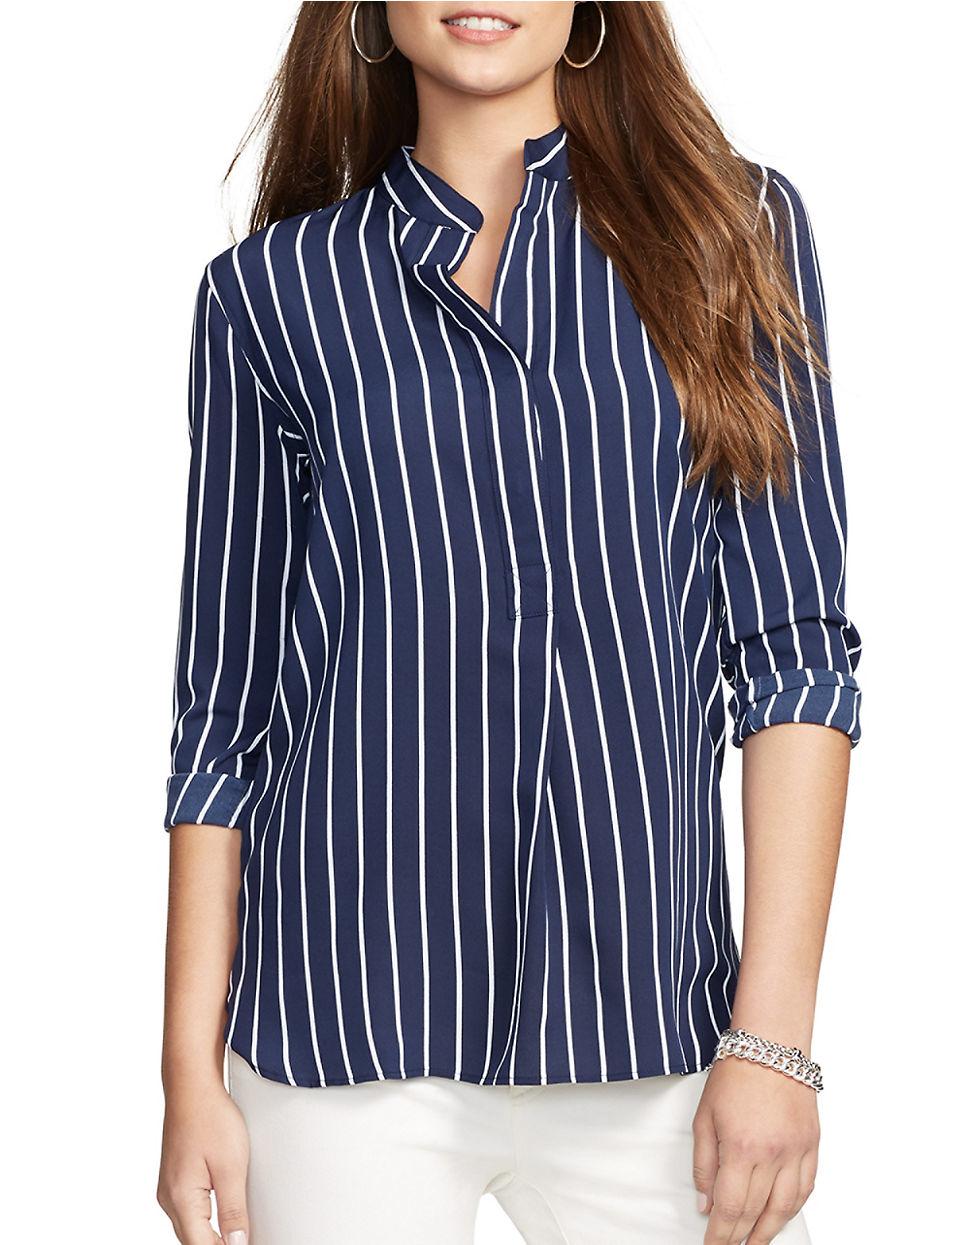 Womens Navy Blue And White Striped Shirt Photo Album ...